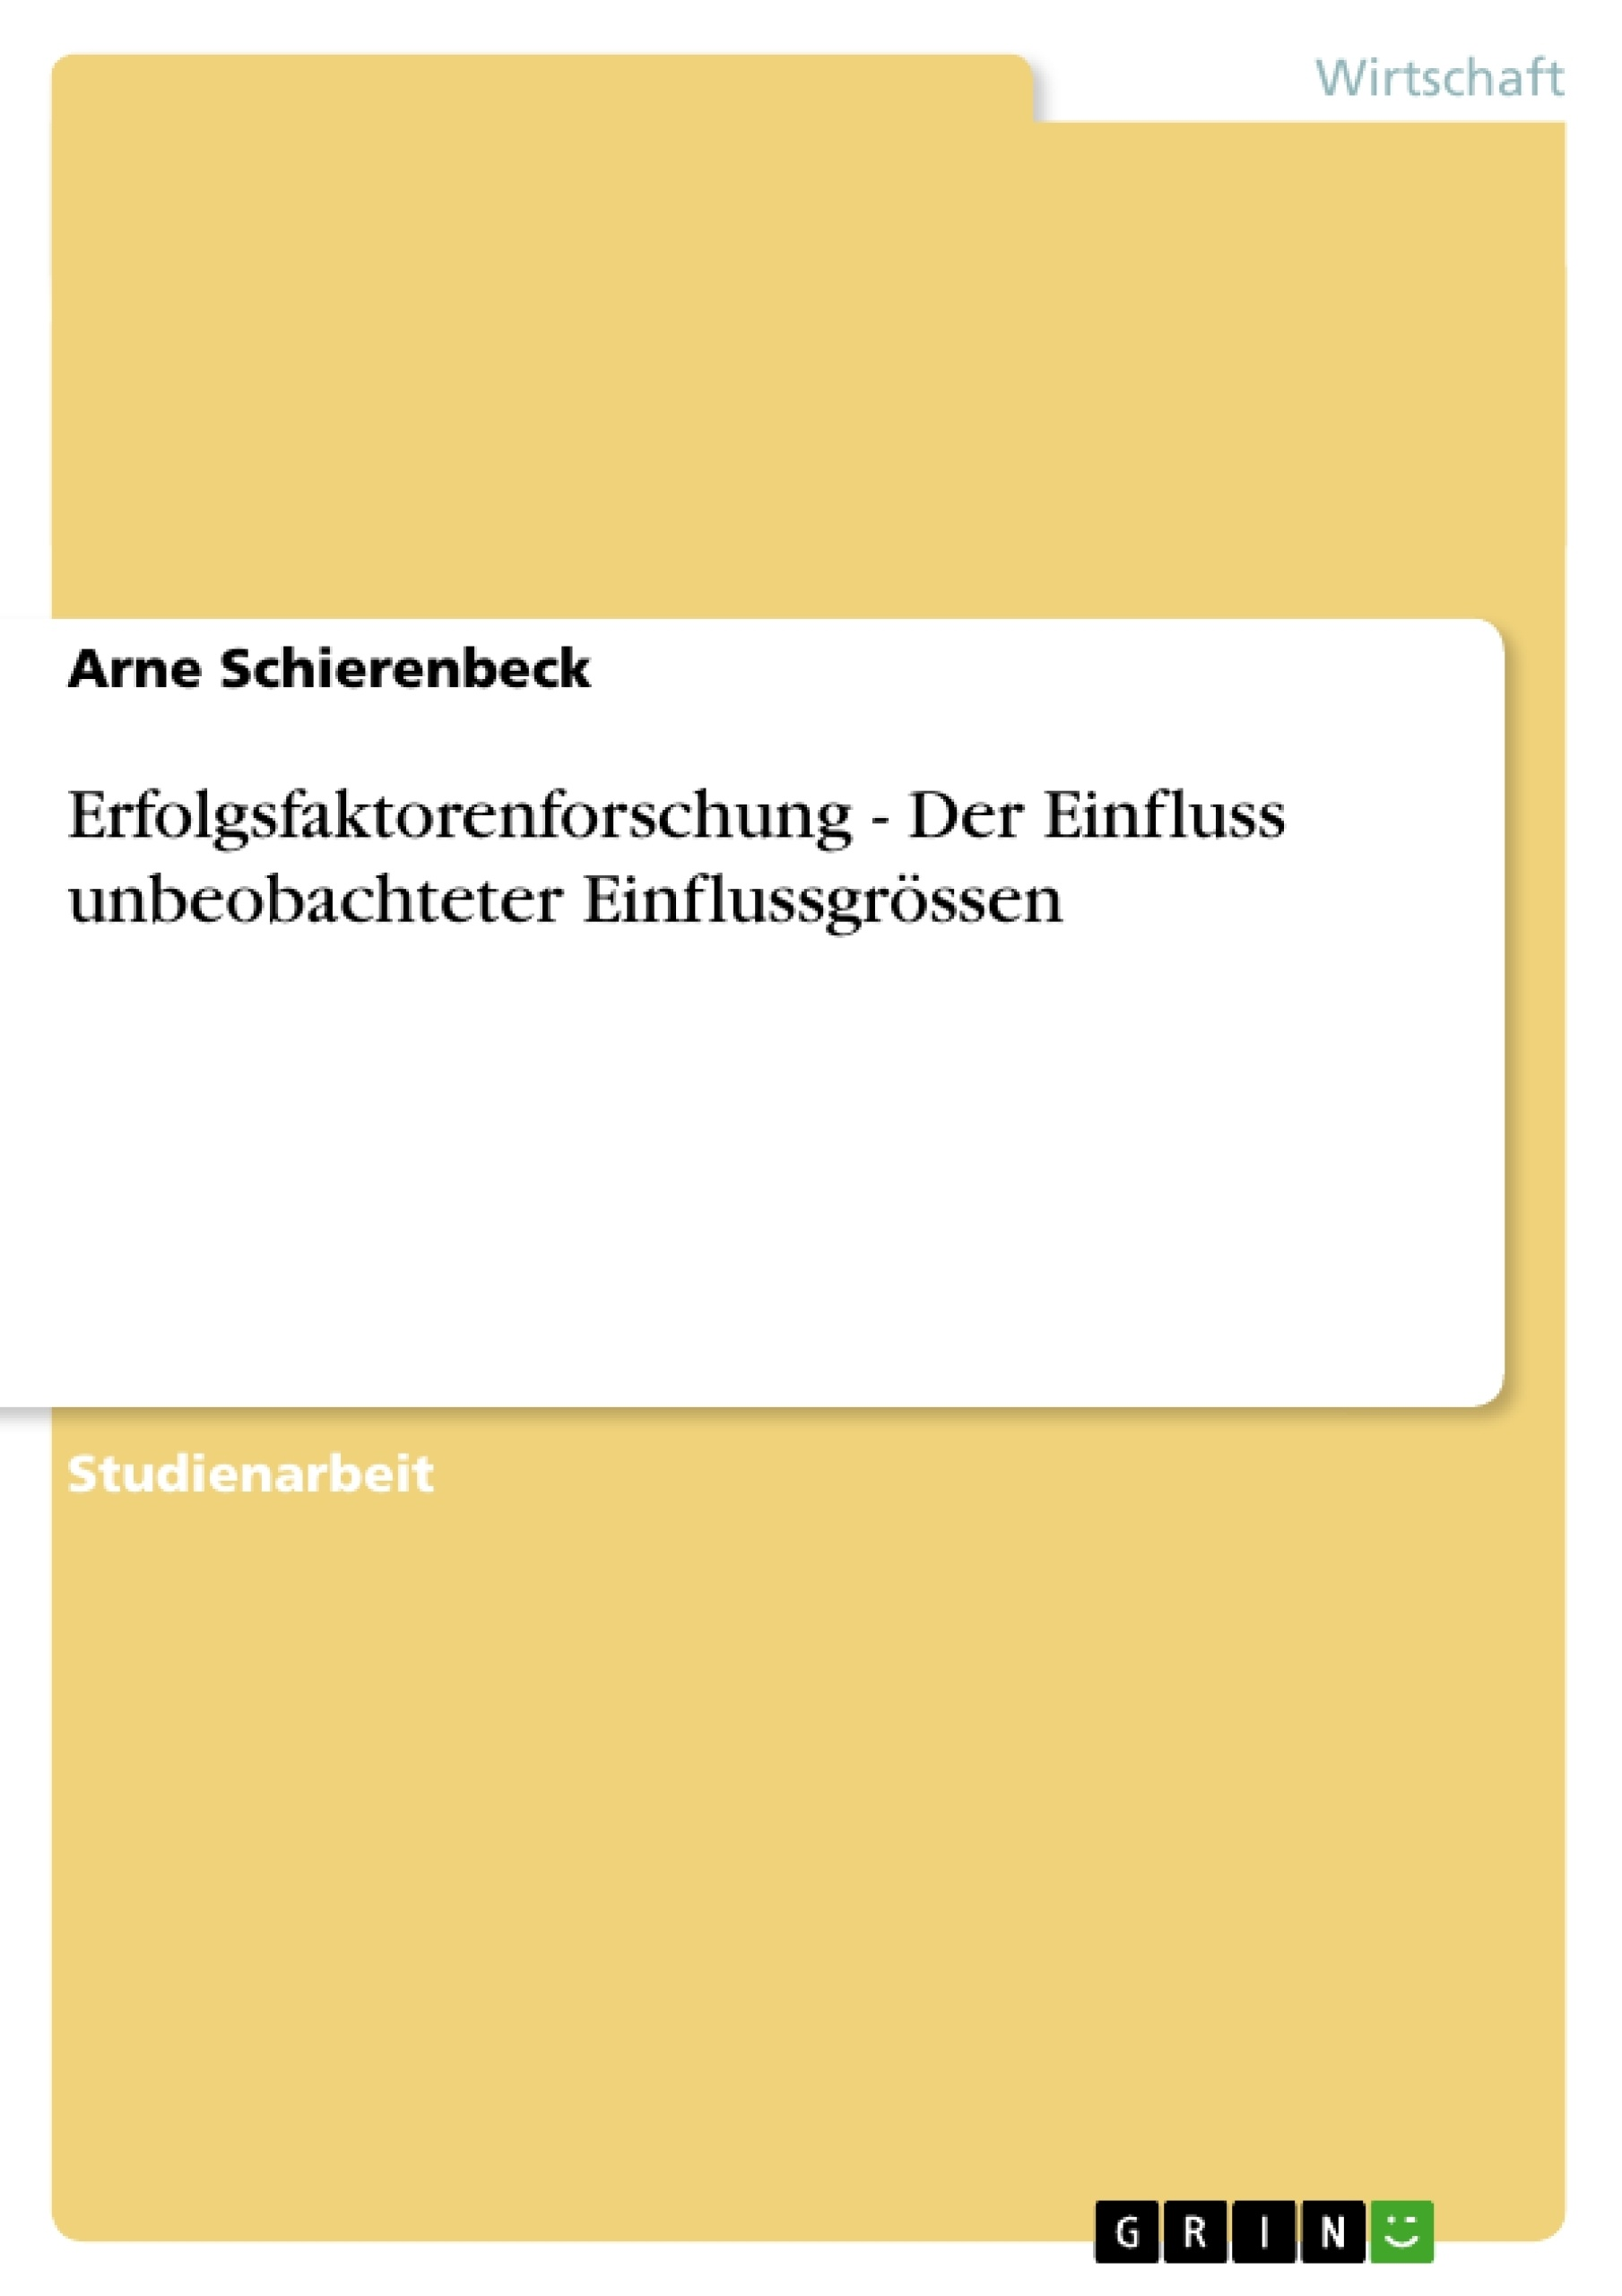 Titel: Erfolgsfaktorenforschung - Der Einfluss unbeobachteter Einflussgrössen